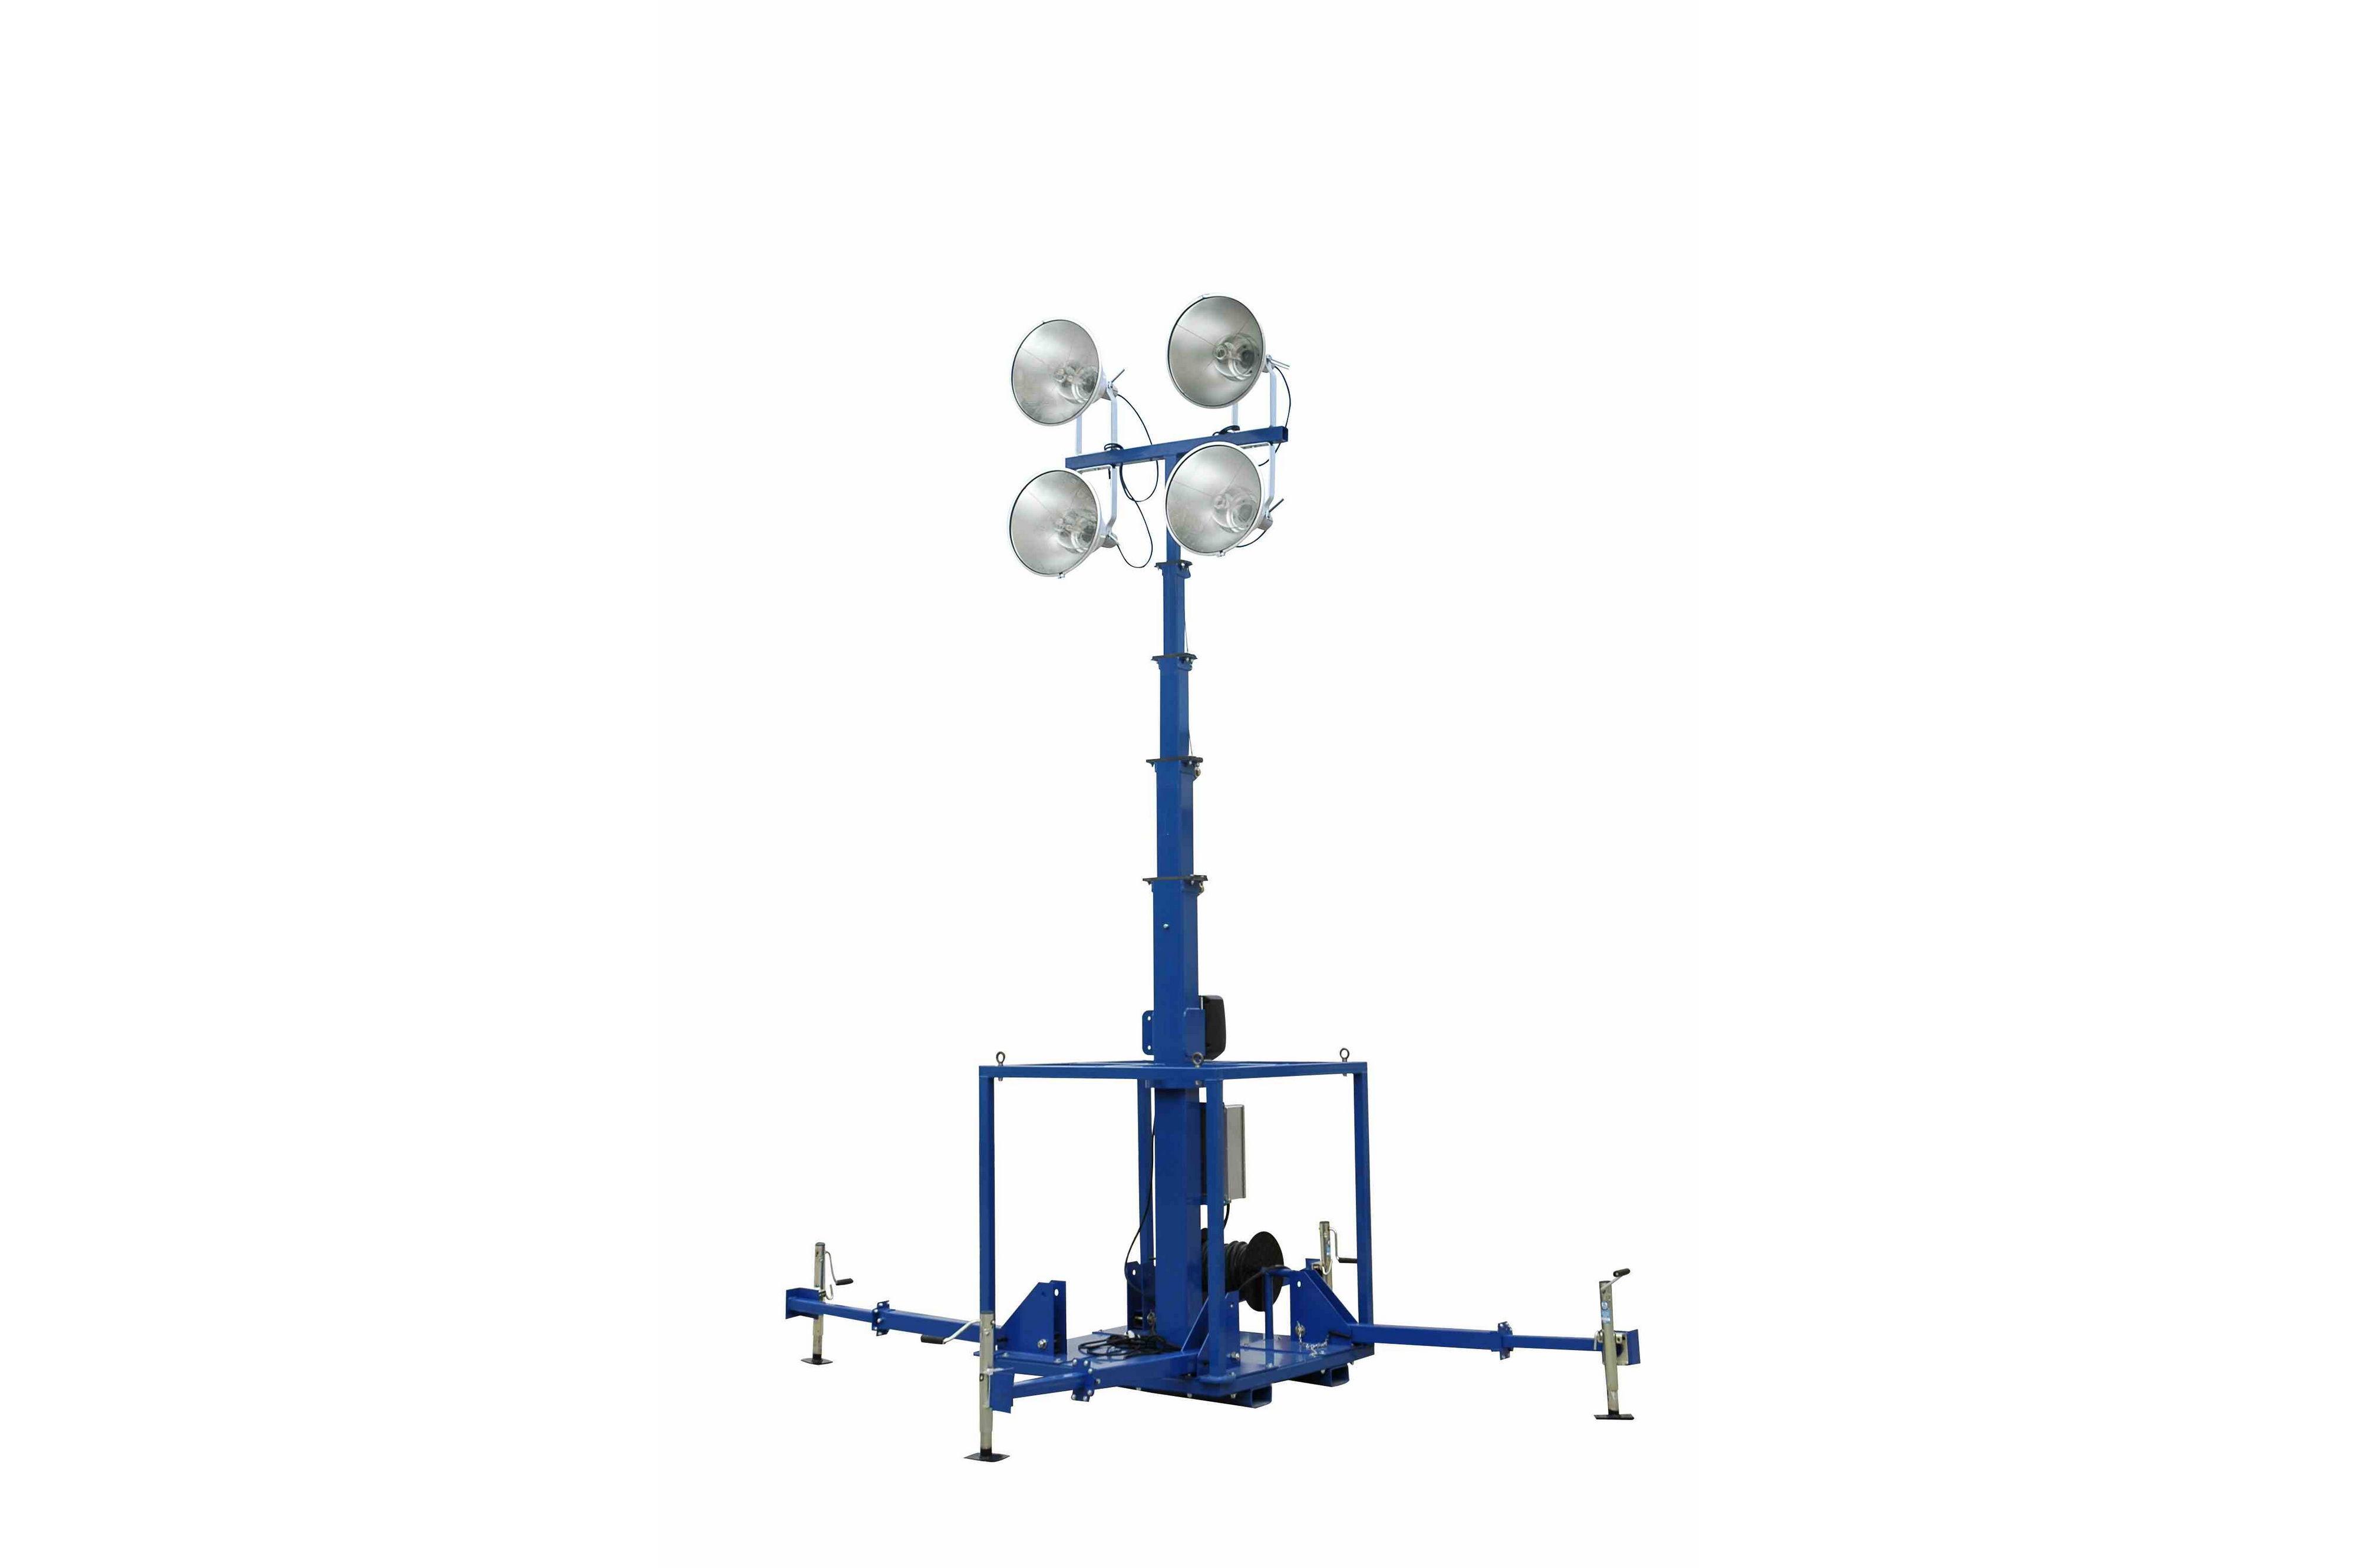 Watt High Intensity Metal Halide Skid Mount Light Mast Released By Larson Electronics